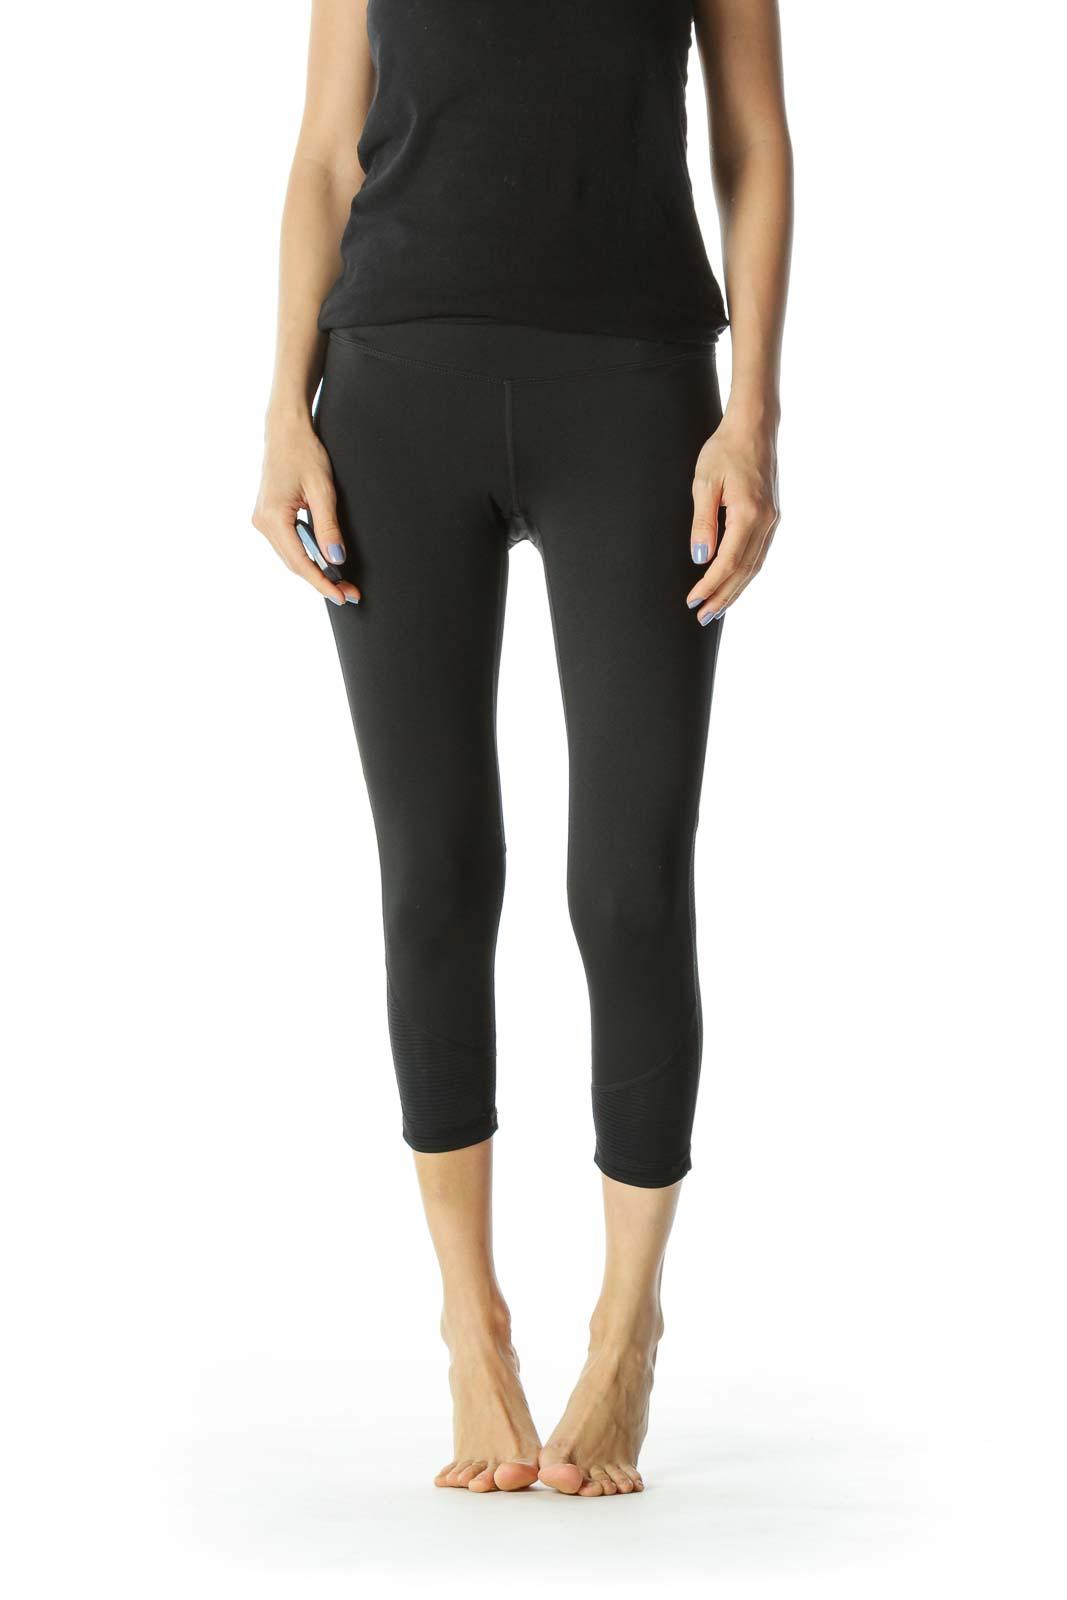 Black Stretch Sheer Leg Detail Activewear Leggings Front